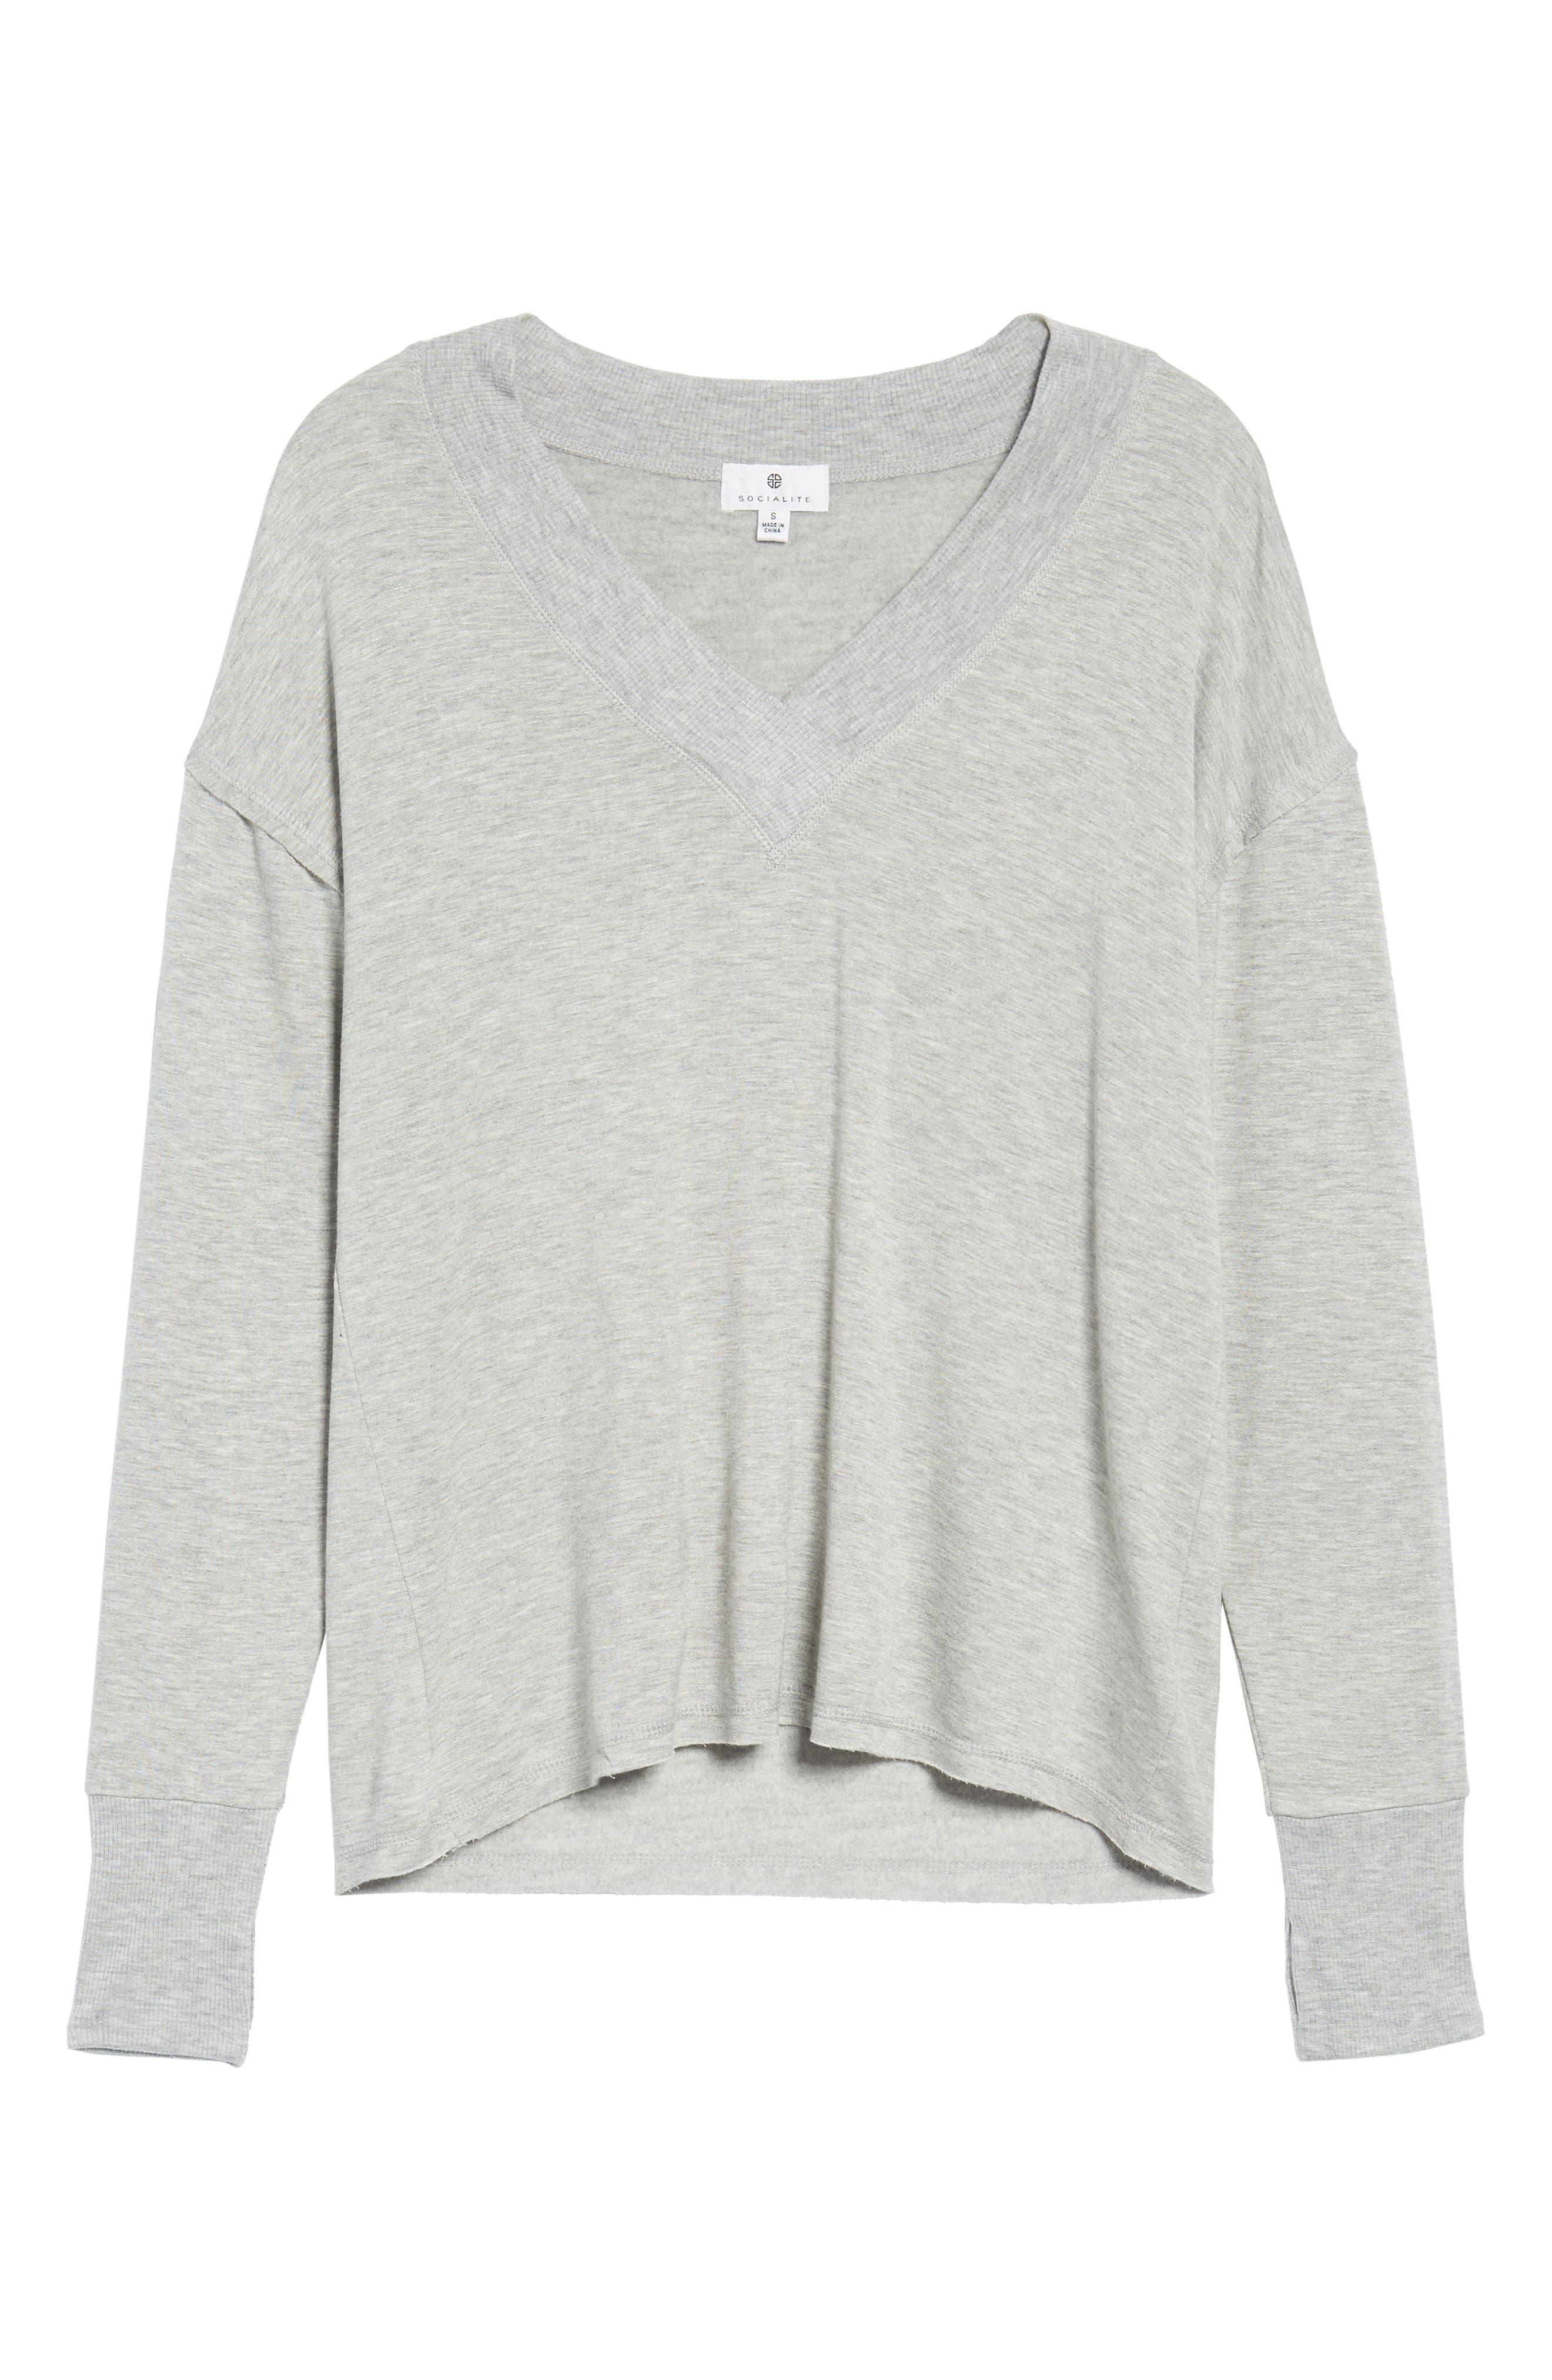 Thumbhole Cuff Sweater,                             Alternate thumbnail 6, color,                             020